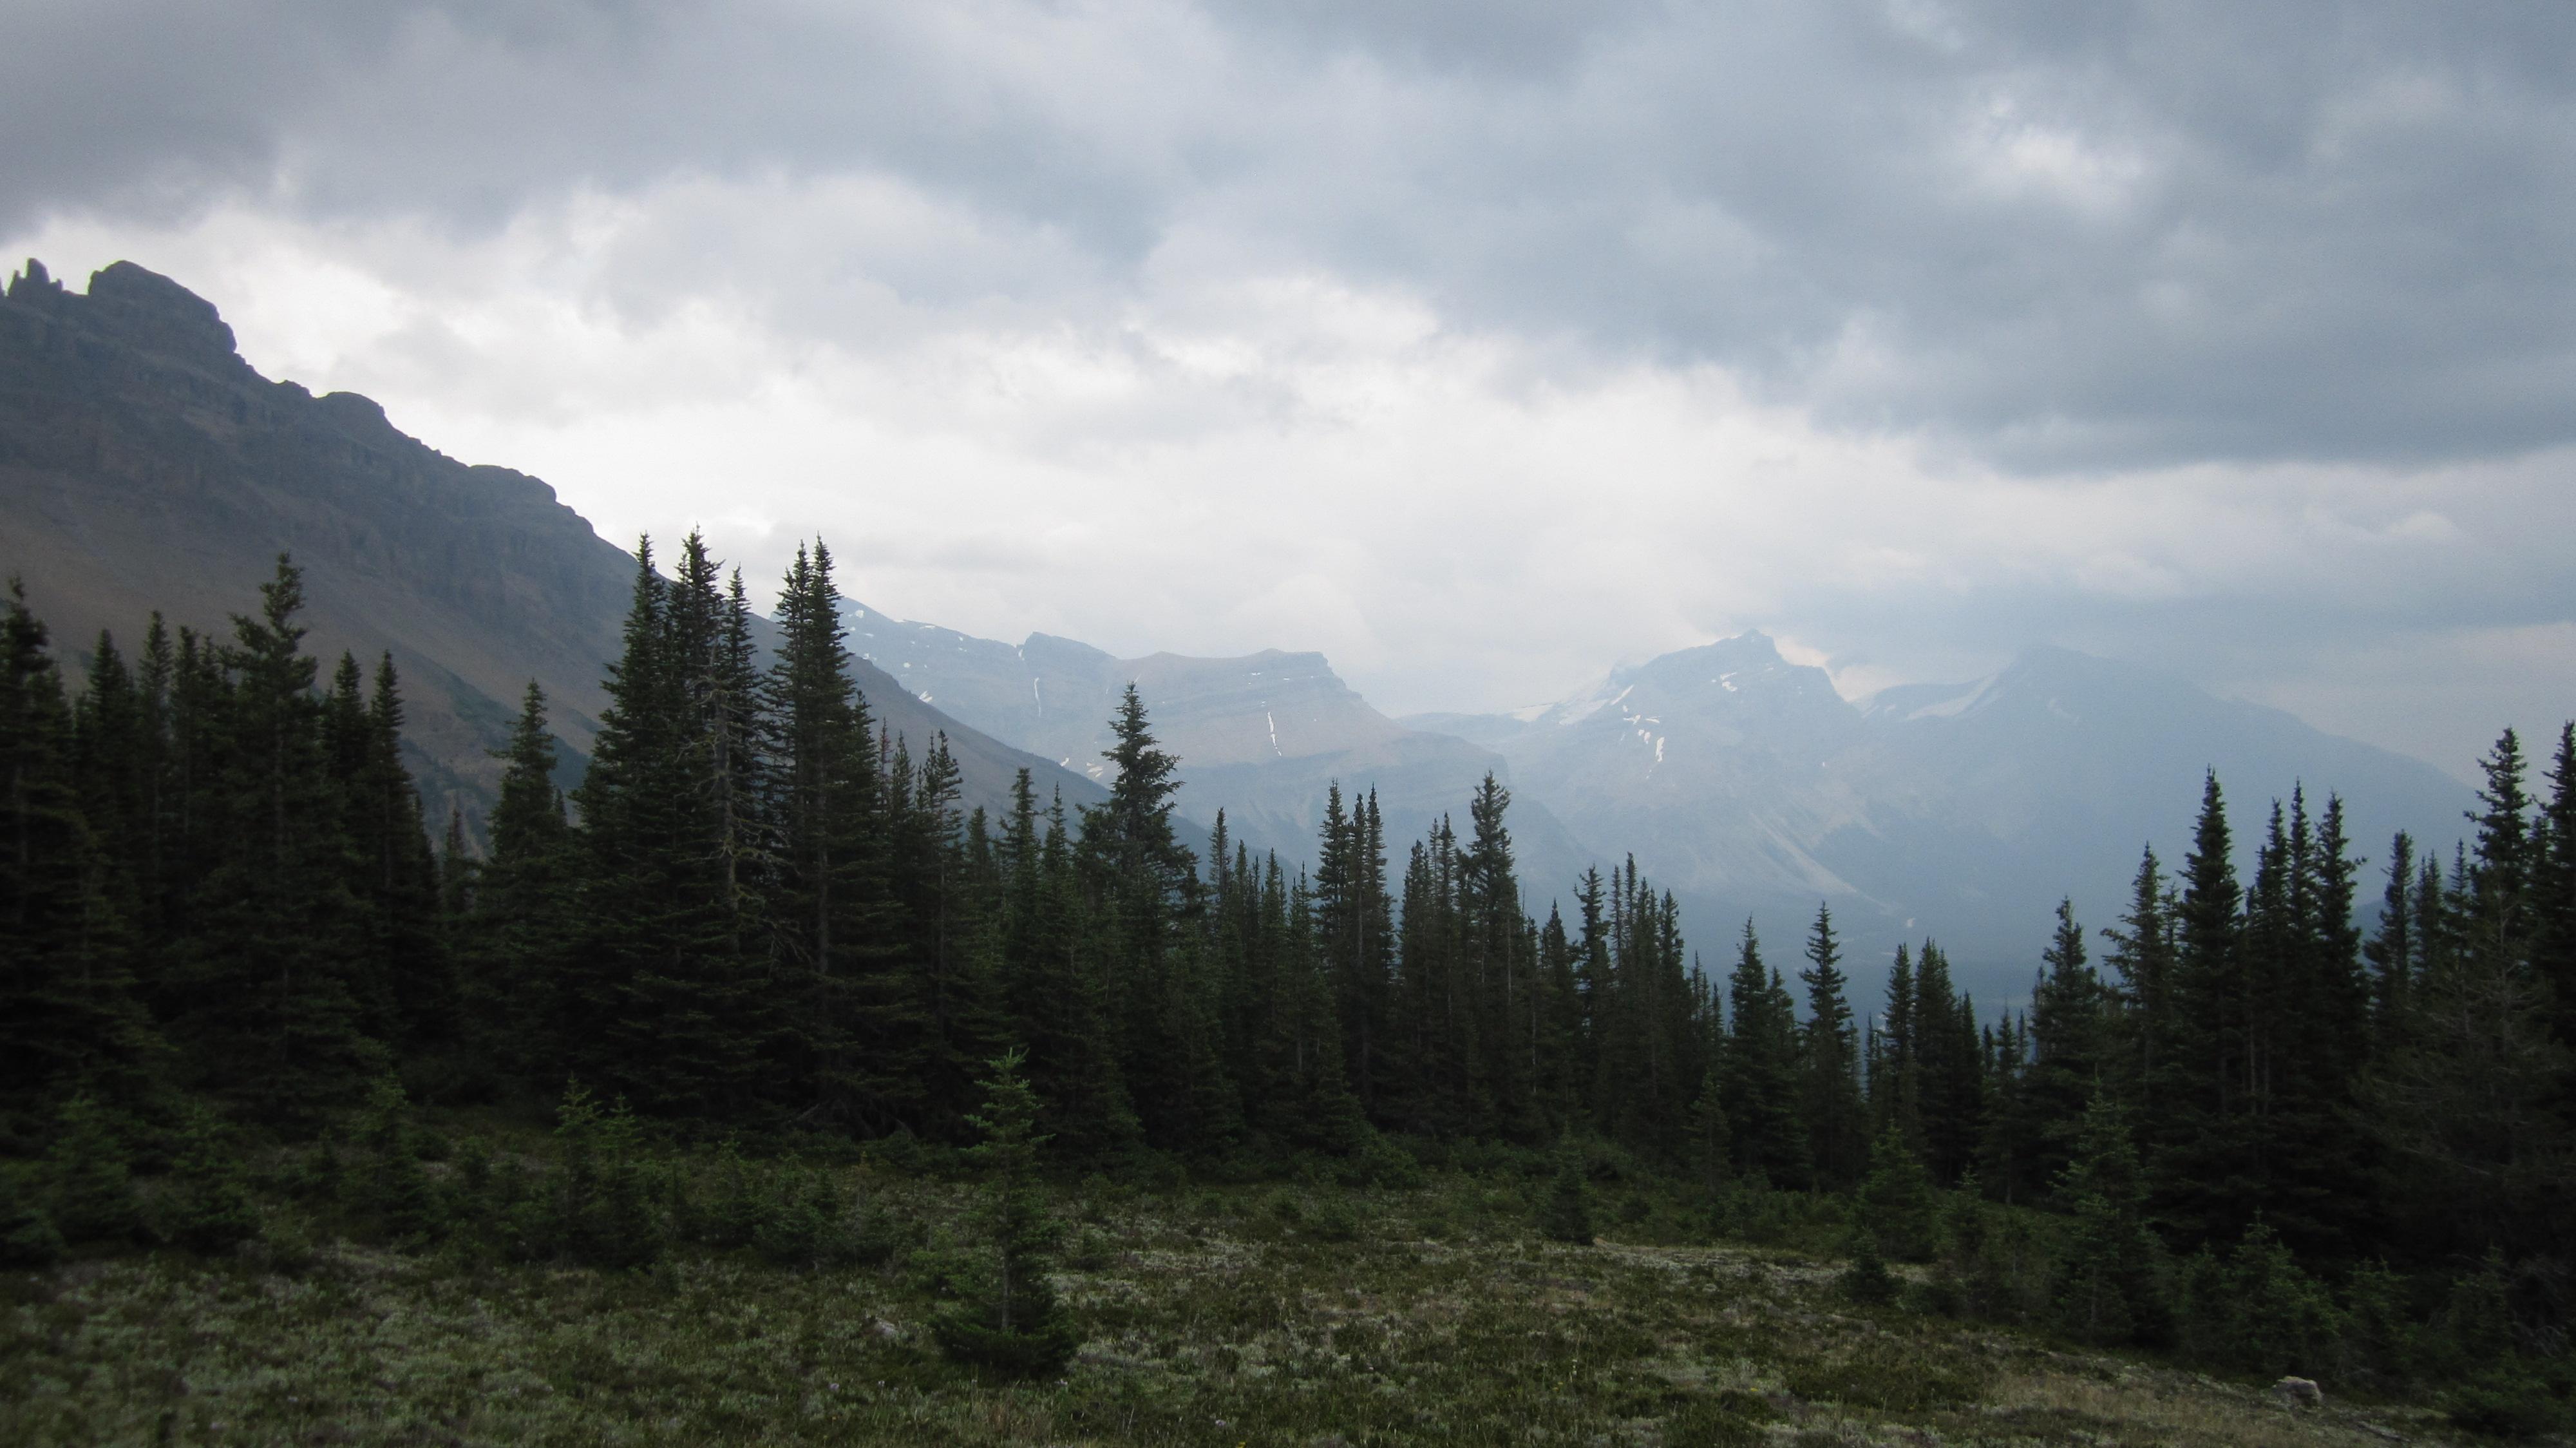 Best Wallpaper Mountain Rain - rain_clouds_in_the_mountains_by_clarkebones  Gallery_788485.jpg